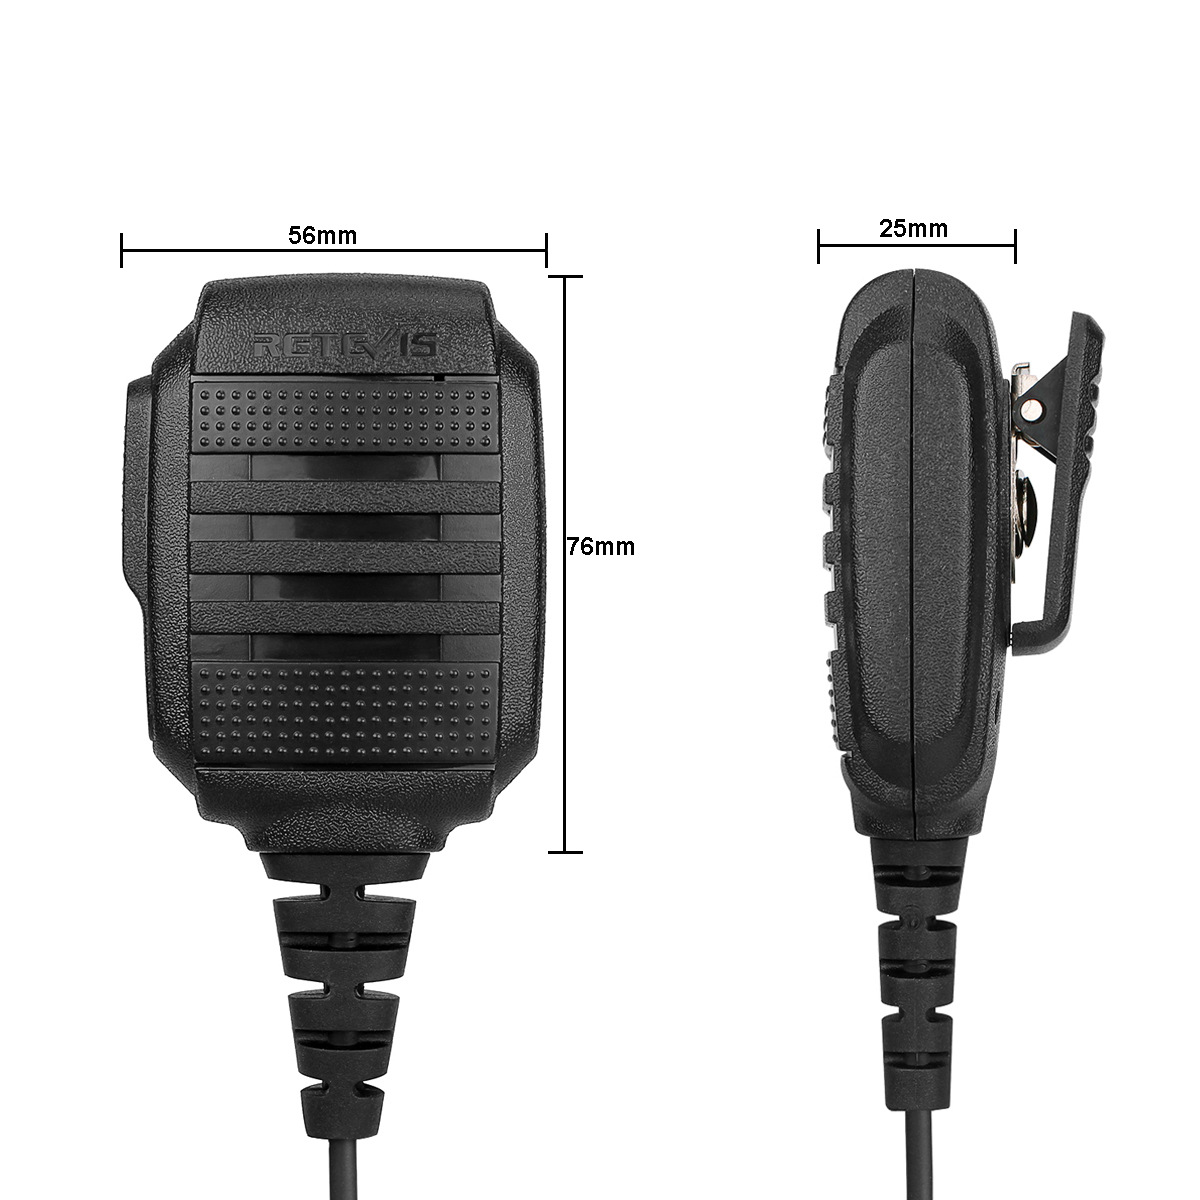 Retevis RS-114 IP54 Waterproof Speaker Microphone For Retevis H777 RT-5R RT22 Baofeng UV-5R UV-82 888s Walkie Talkie Accessory